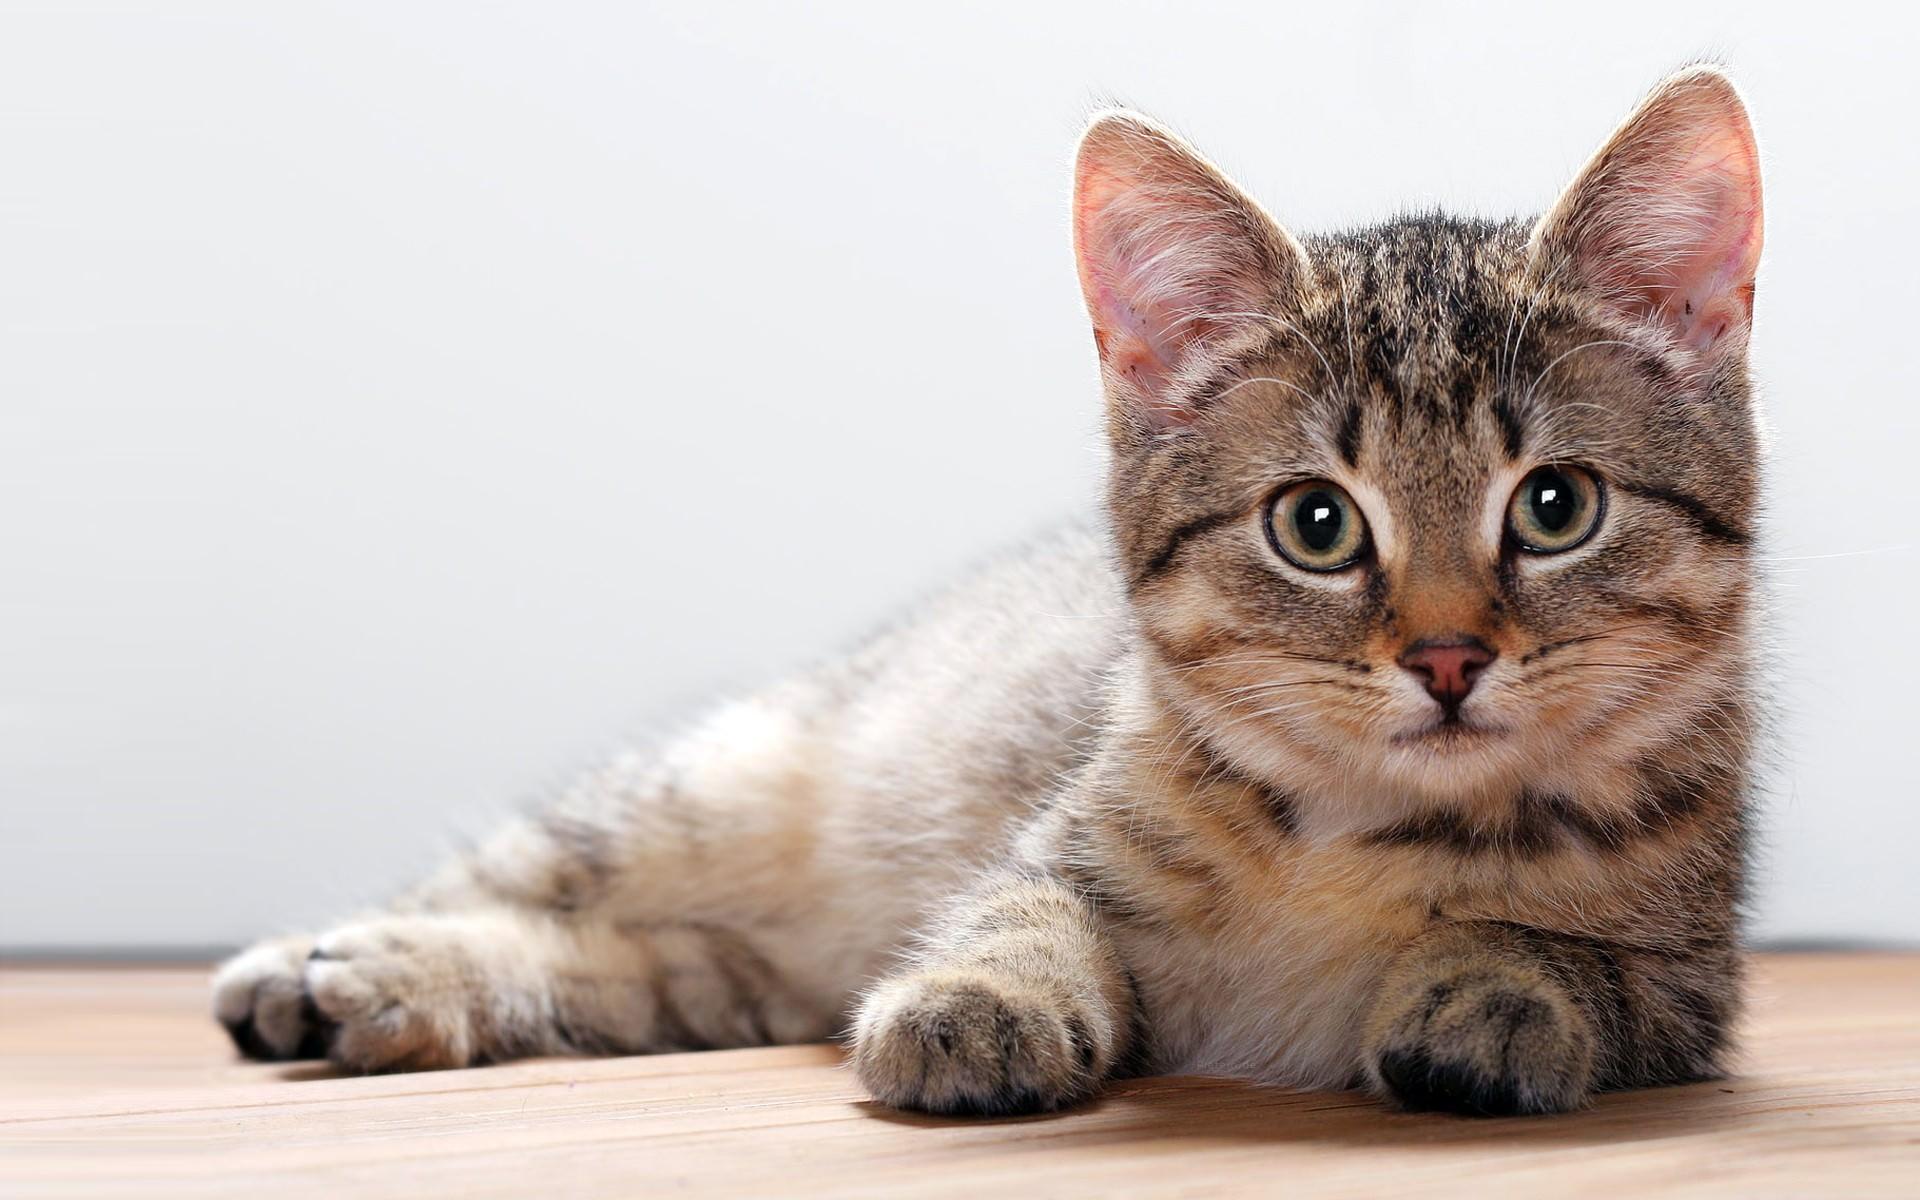 Pc用猫の壁紙 Cat 猫 ねこ画像まとめ 7 08更新 Naver まとめ